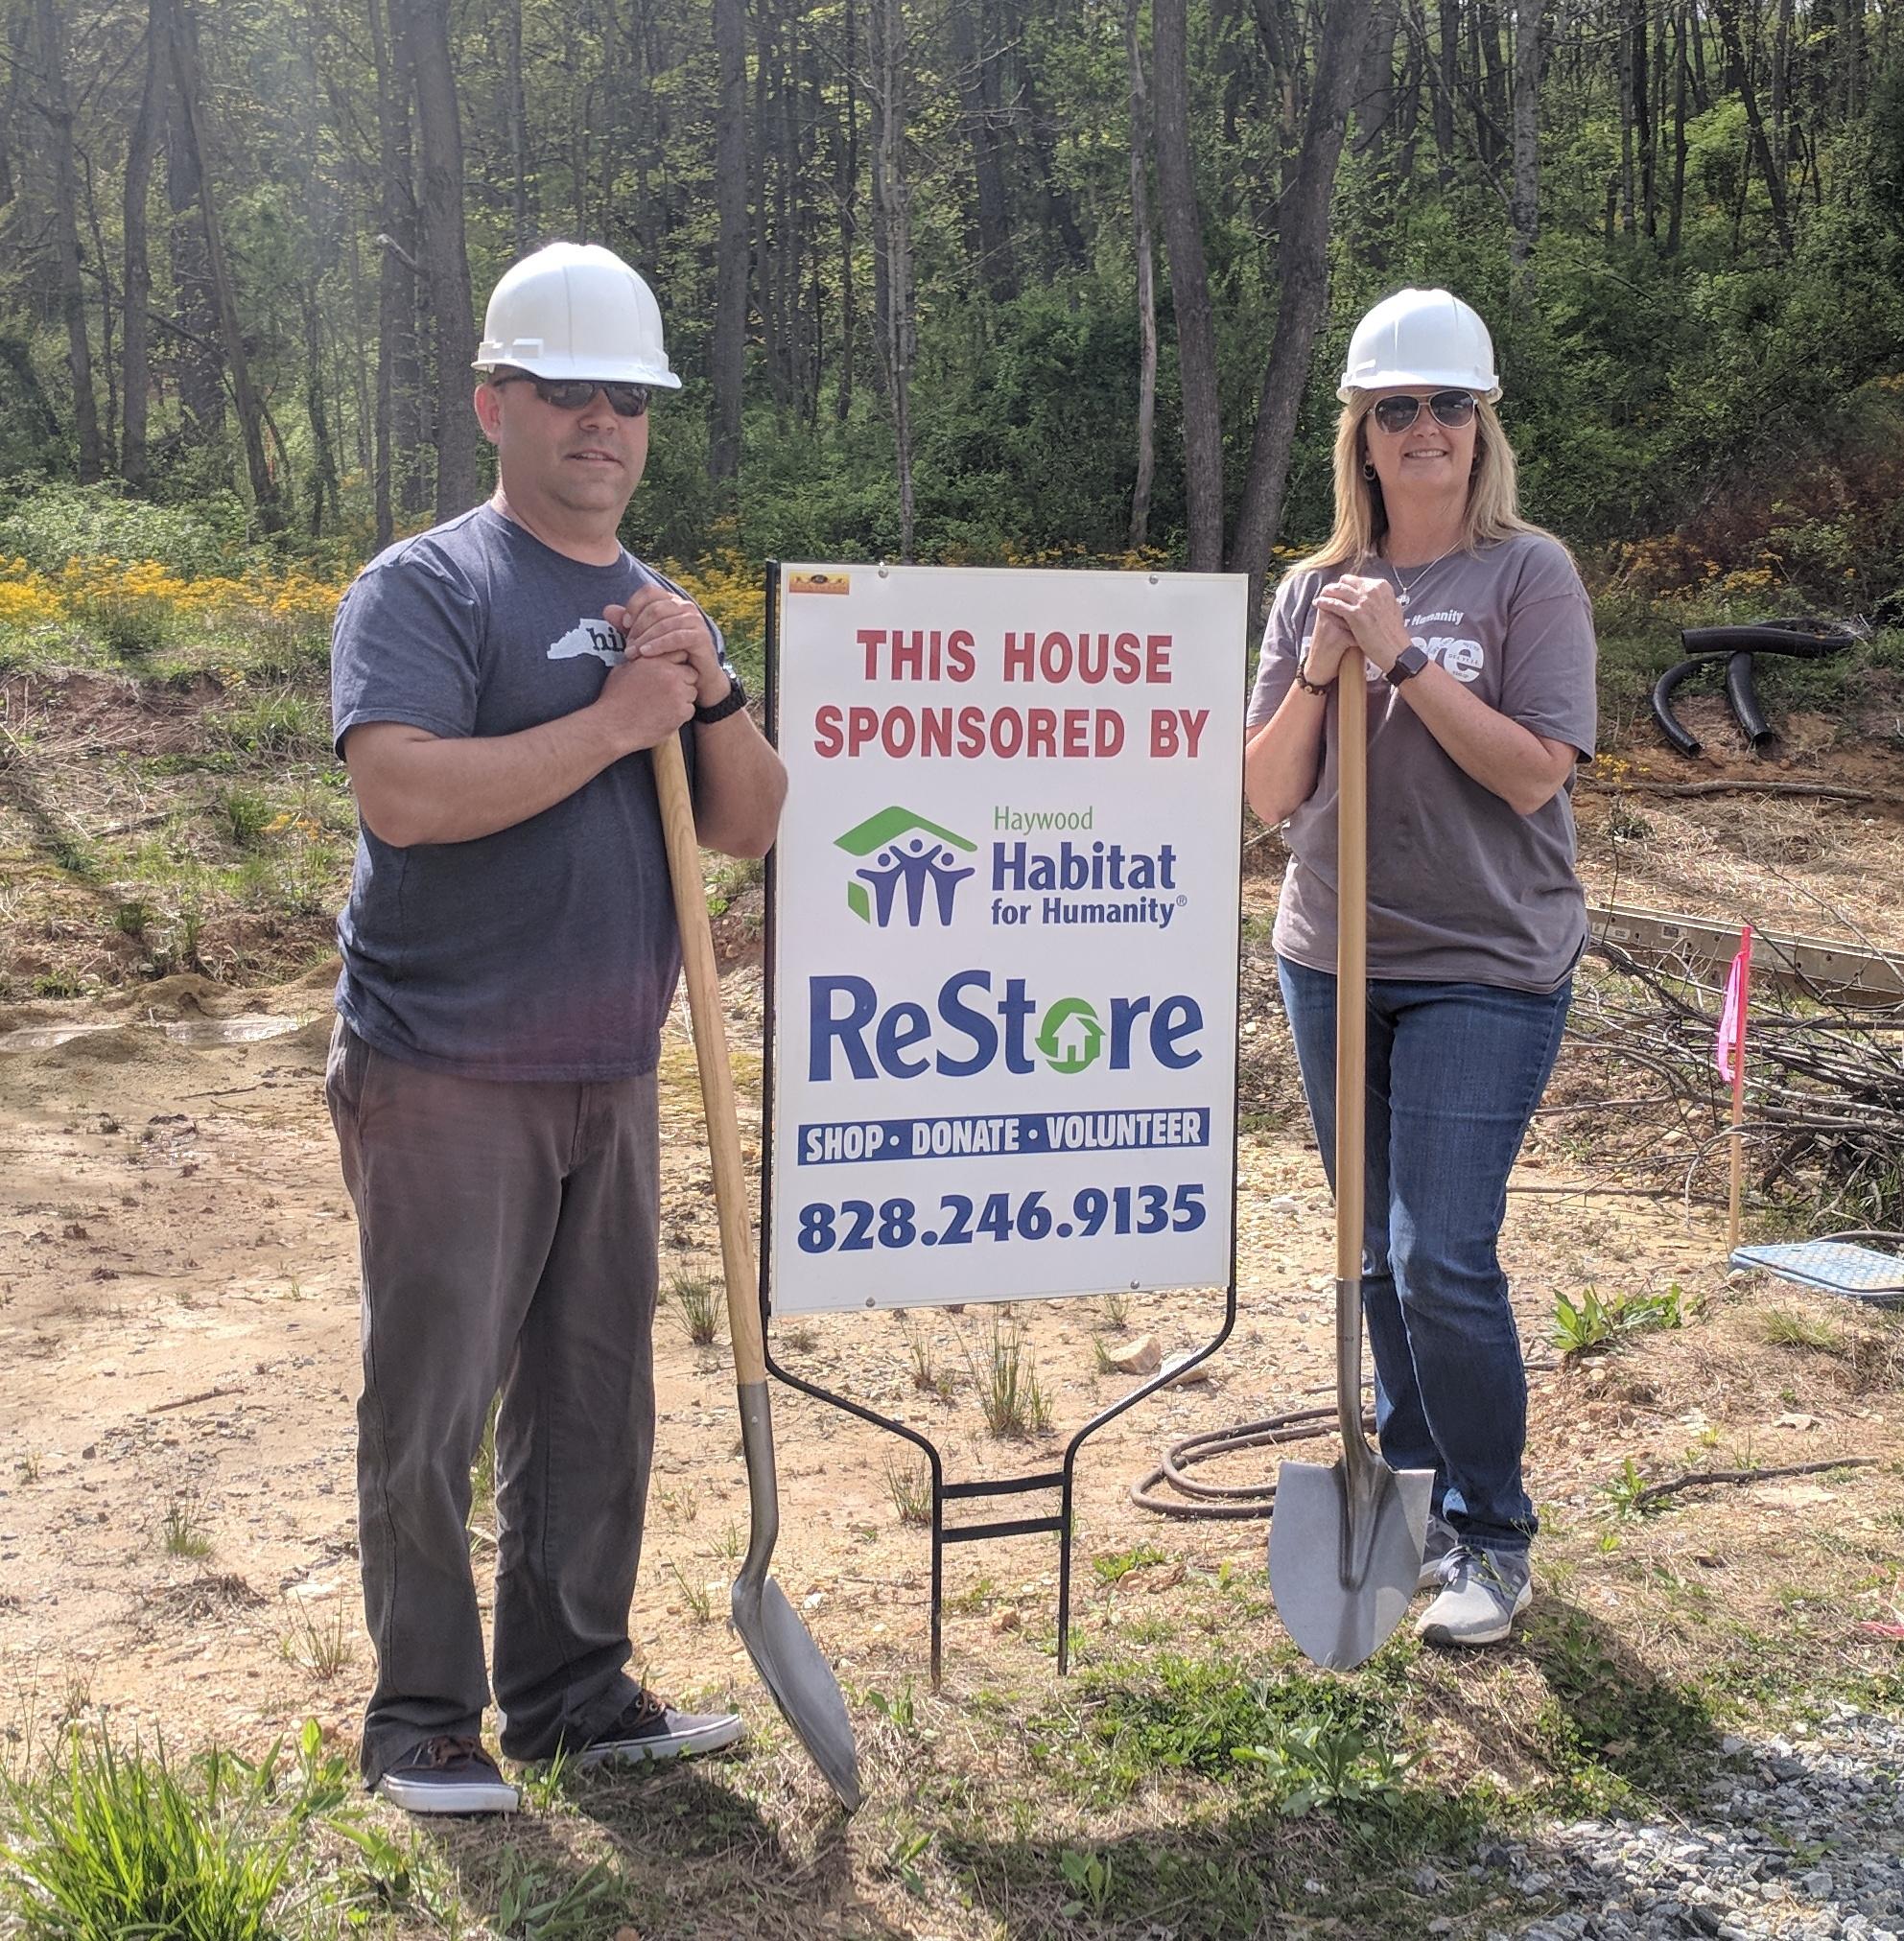 ReStore sponsoring last home in Walton Woods